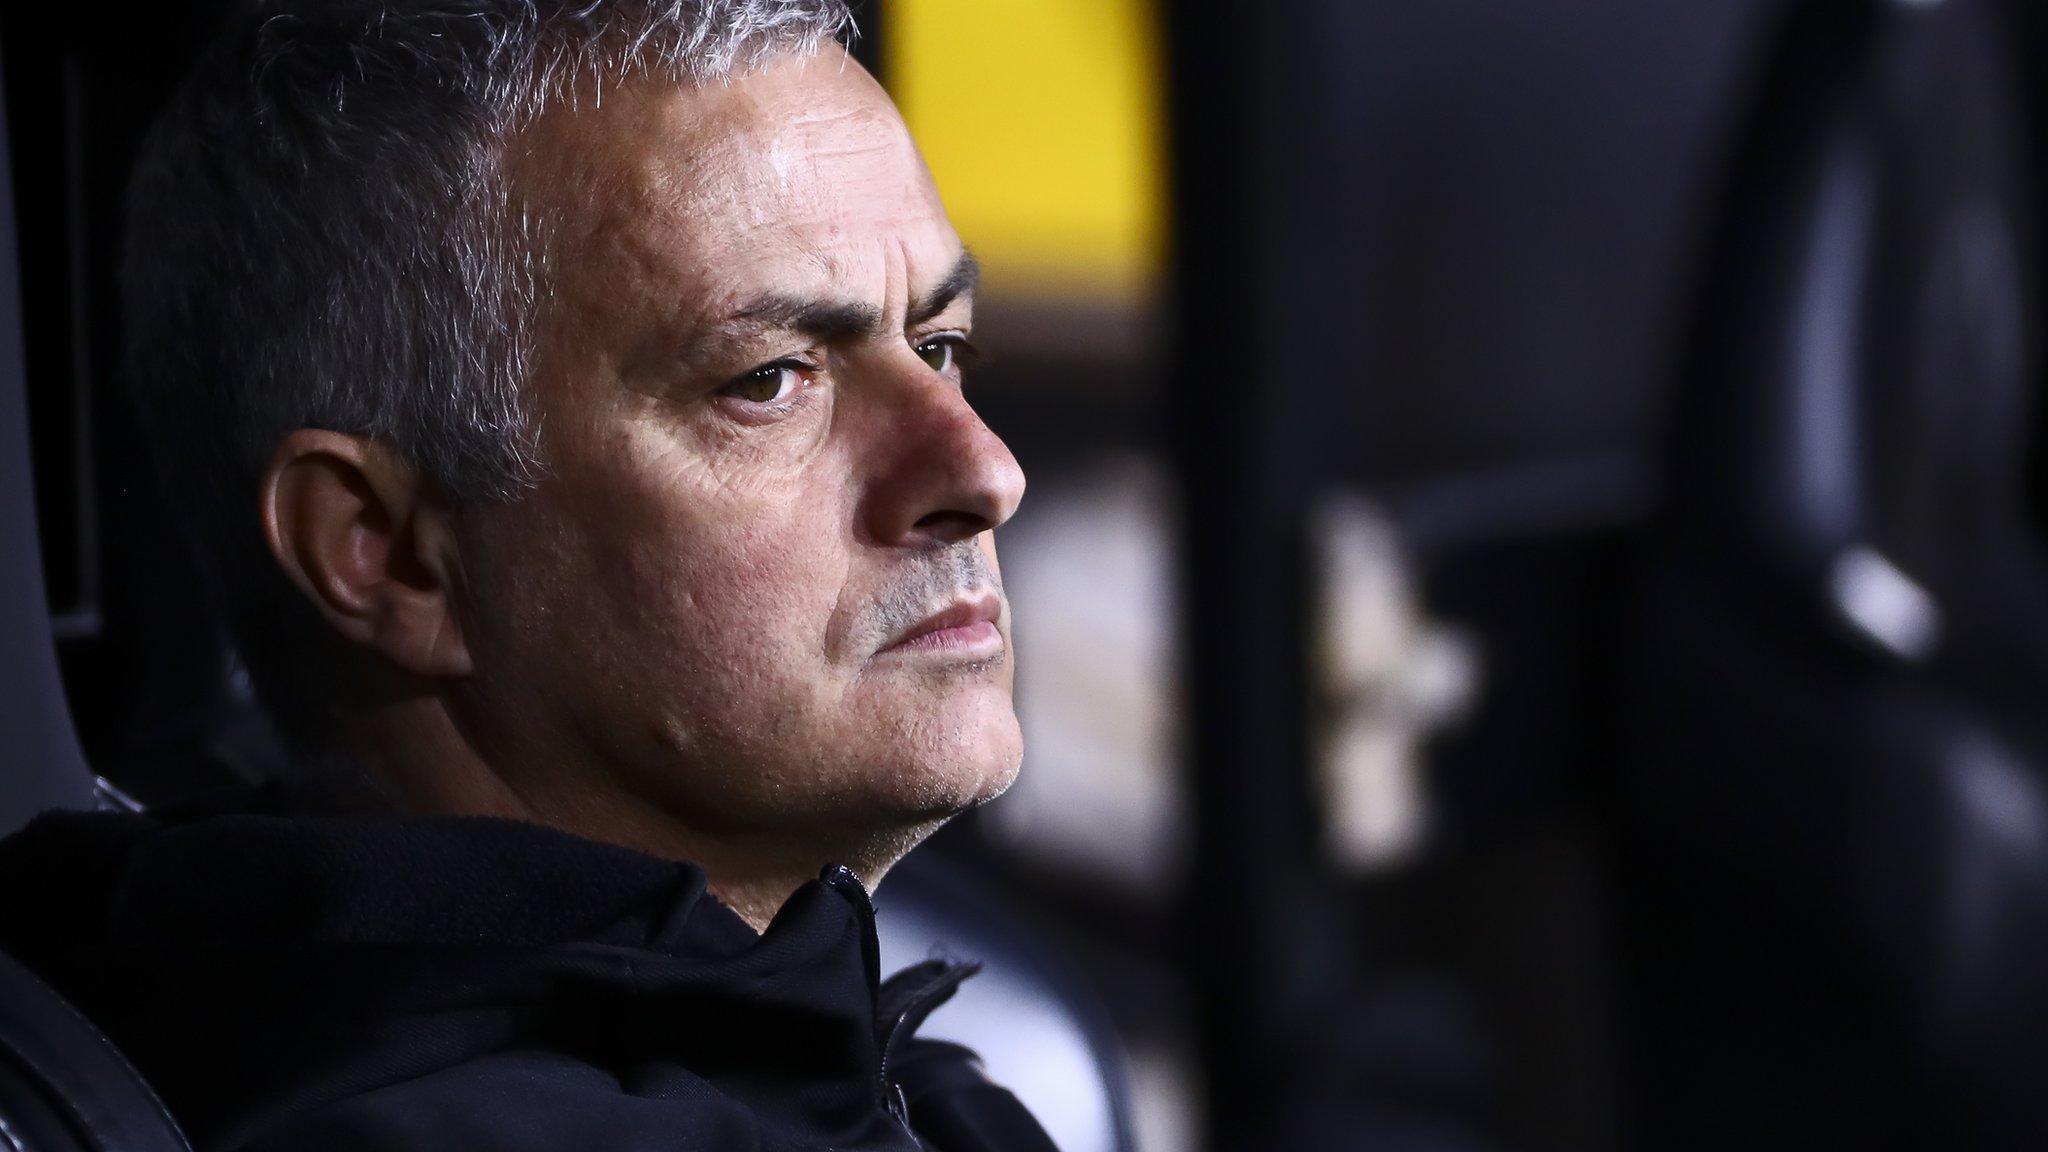 Jose Mourinho sacked: Man Utd need to 'reset structure' - Gary Neville